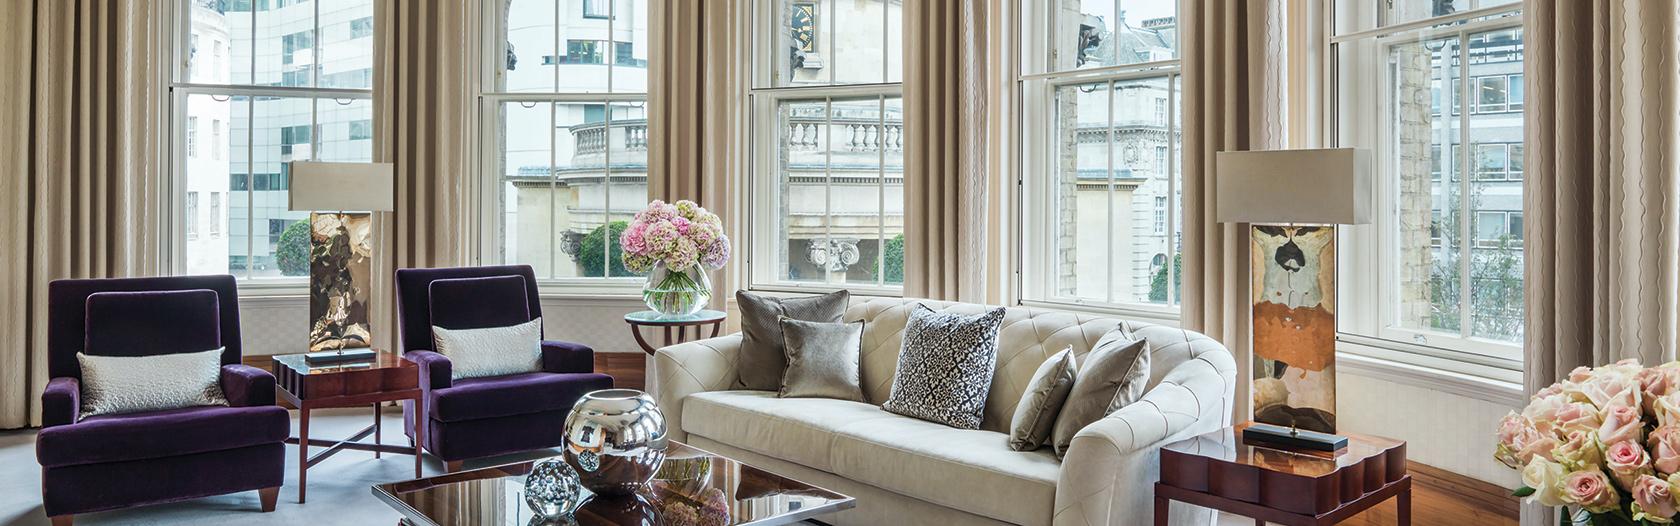 London best hotels: Langham Hotel Club